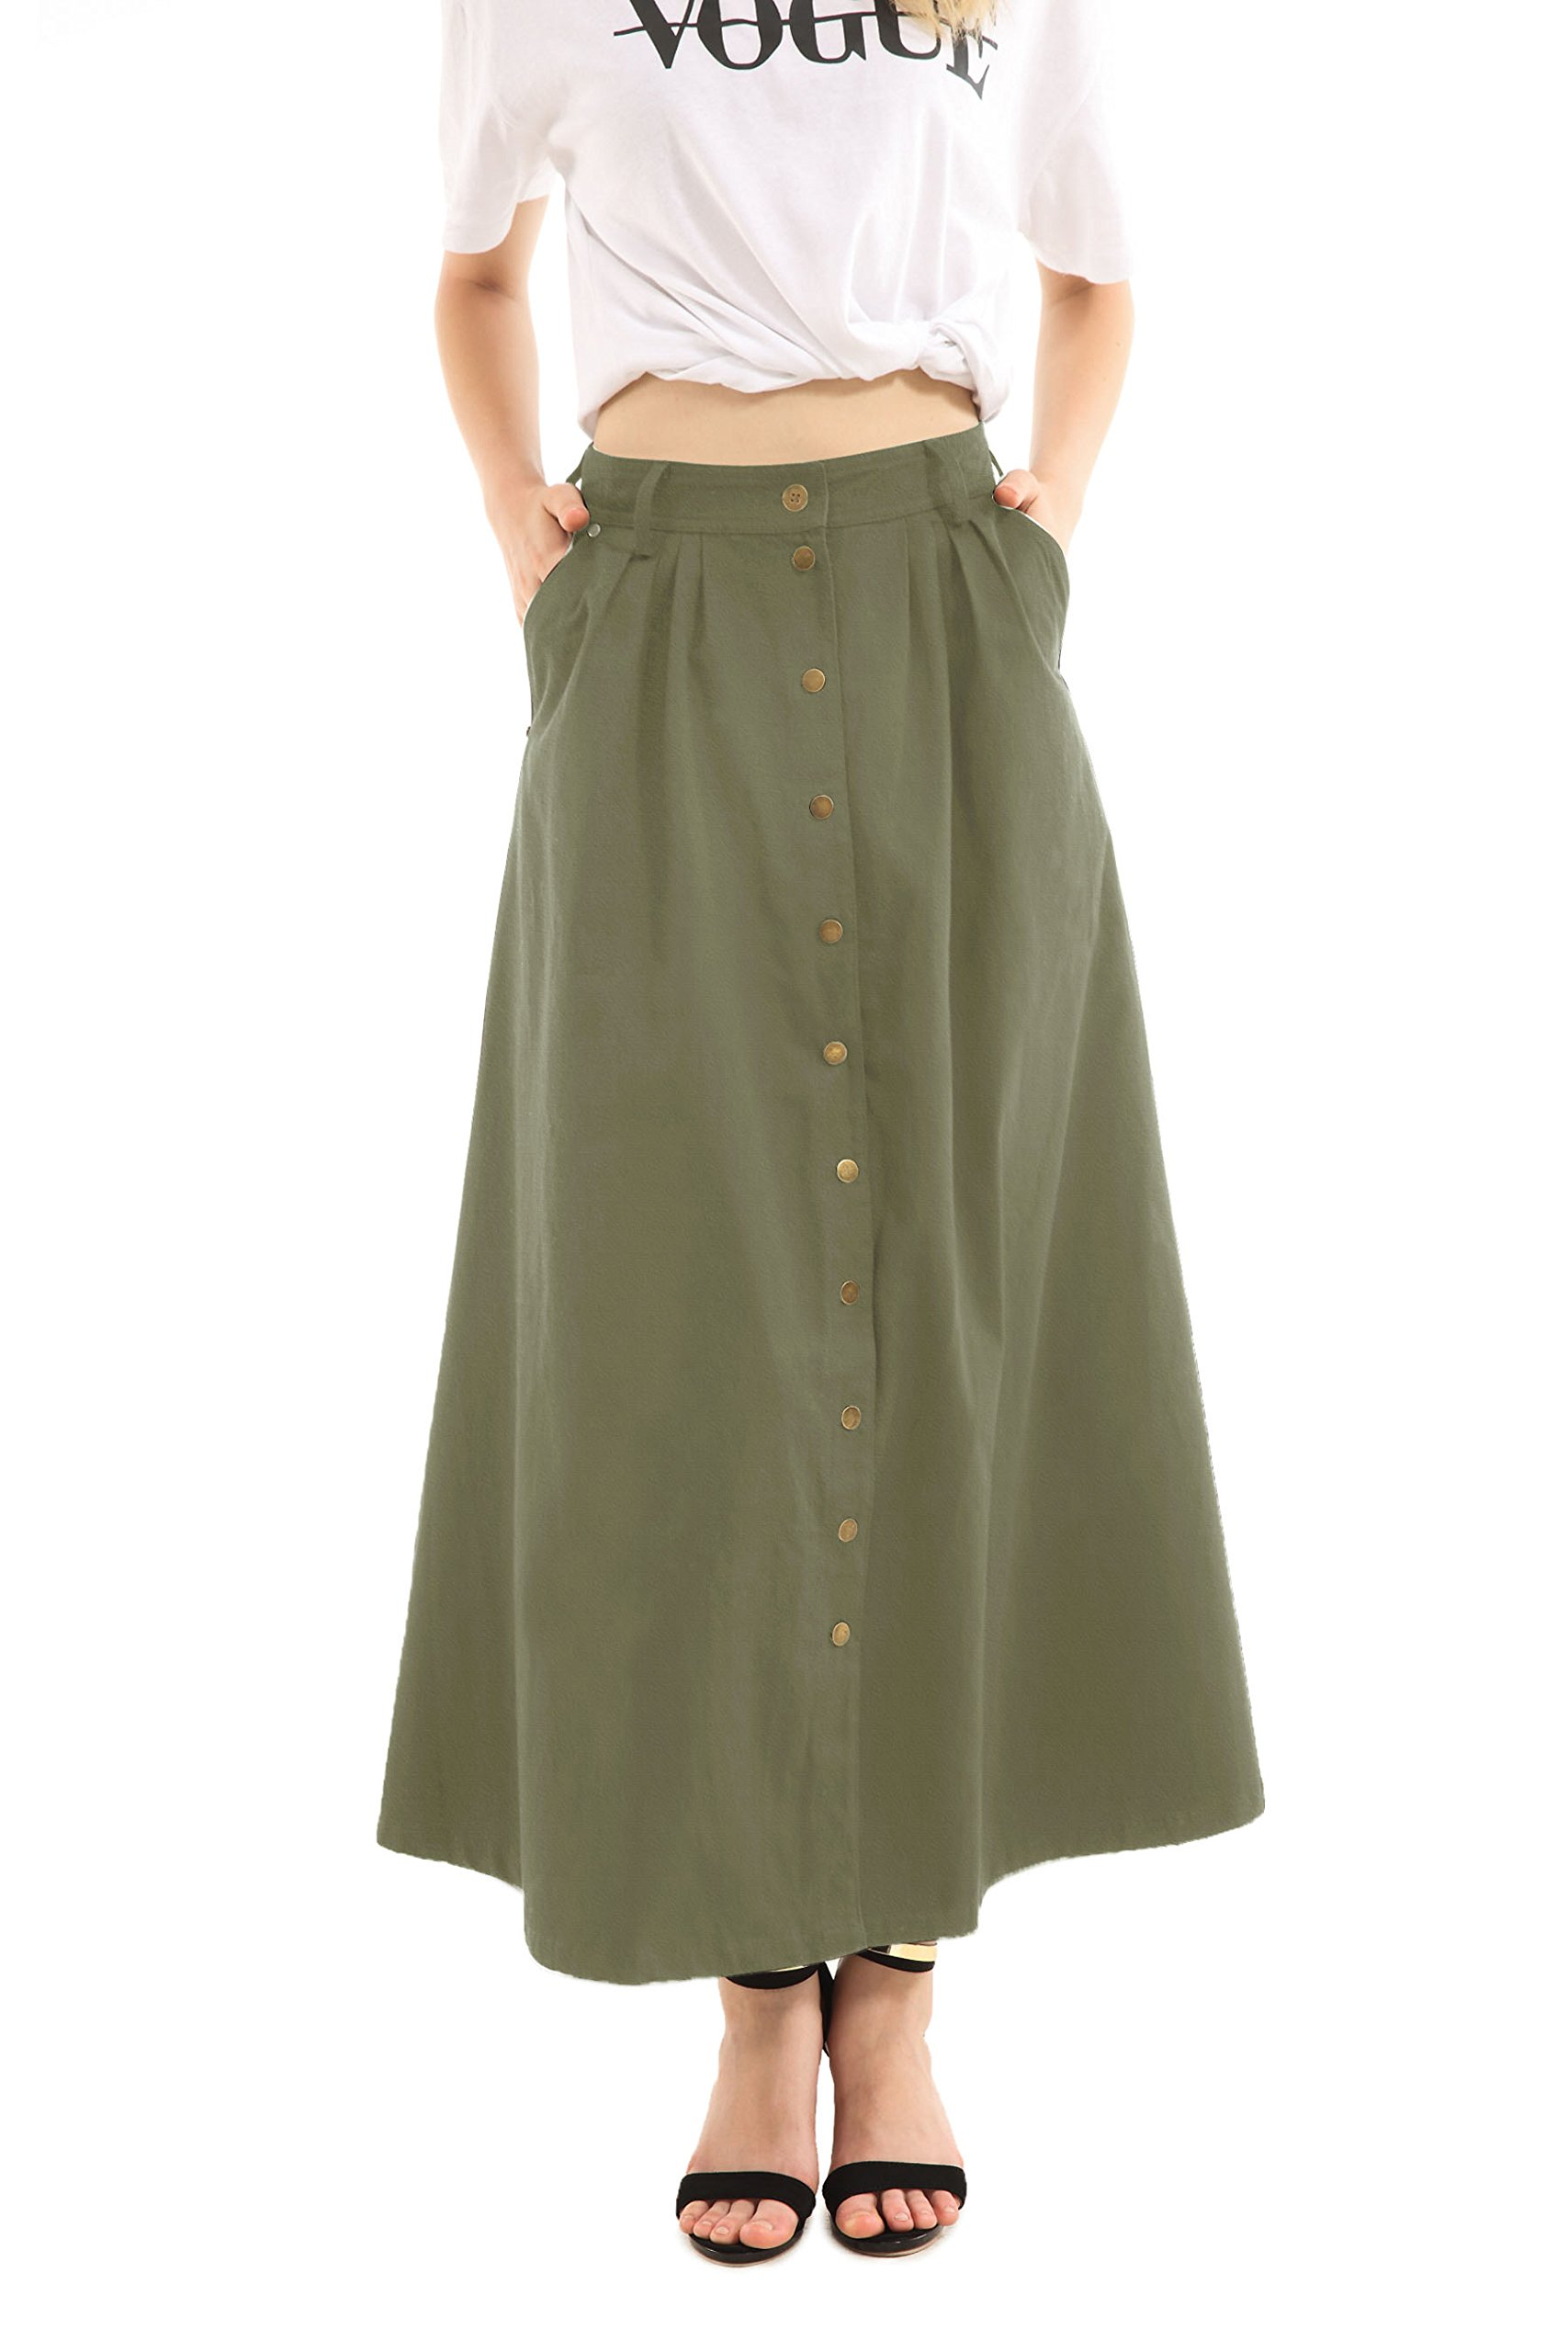 JOAUR Women's Slit Casual Skirts Button Front High Waist Maxi Skirt with Pockets